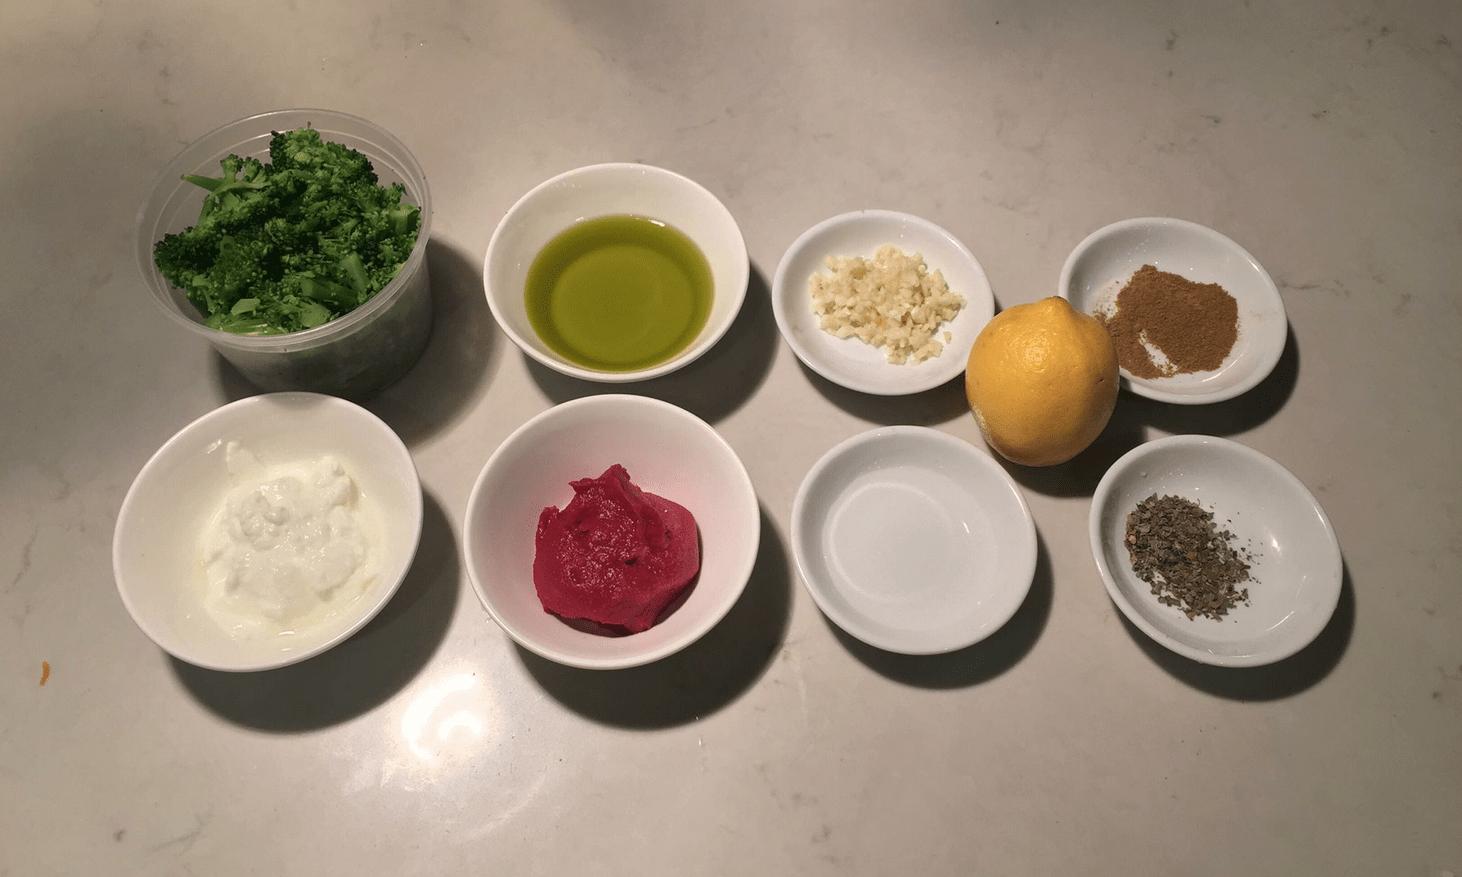 The Urban Peasant's Leftover Broccoli Sauce mise en place.